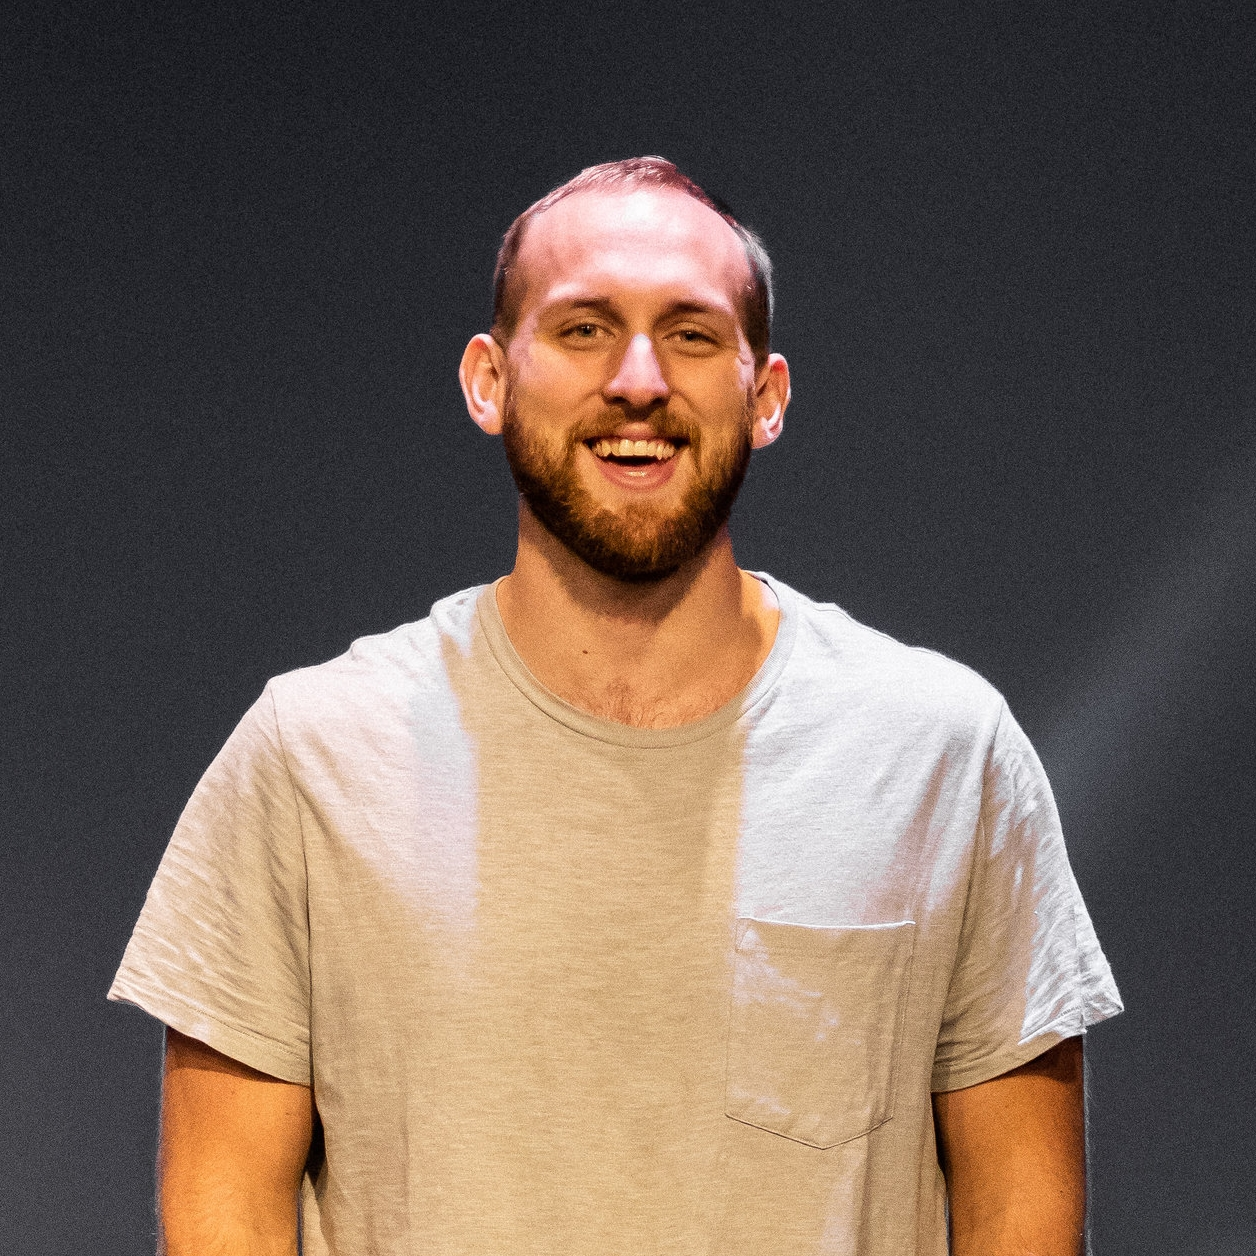 Creative Arts Pastor Kyle Erwin